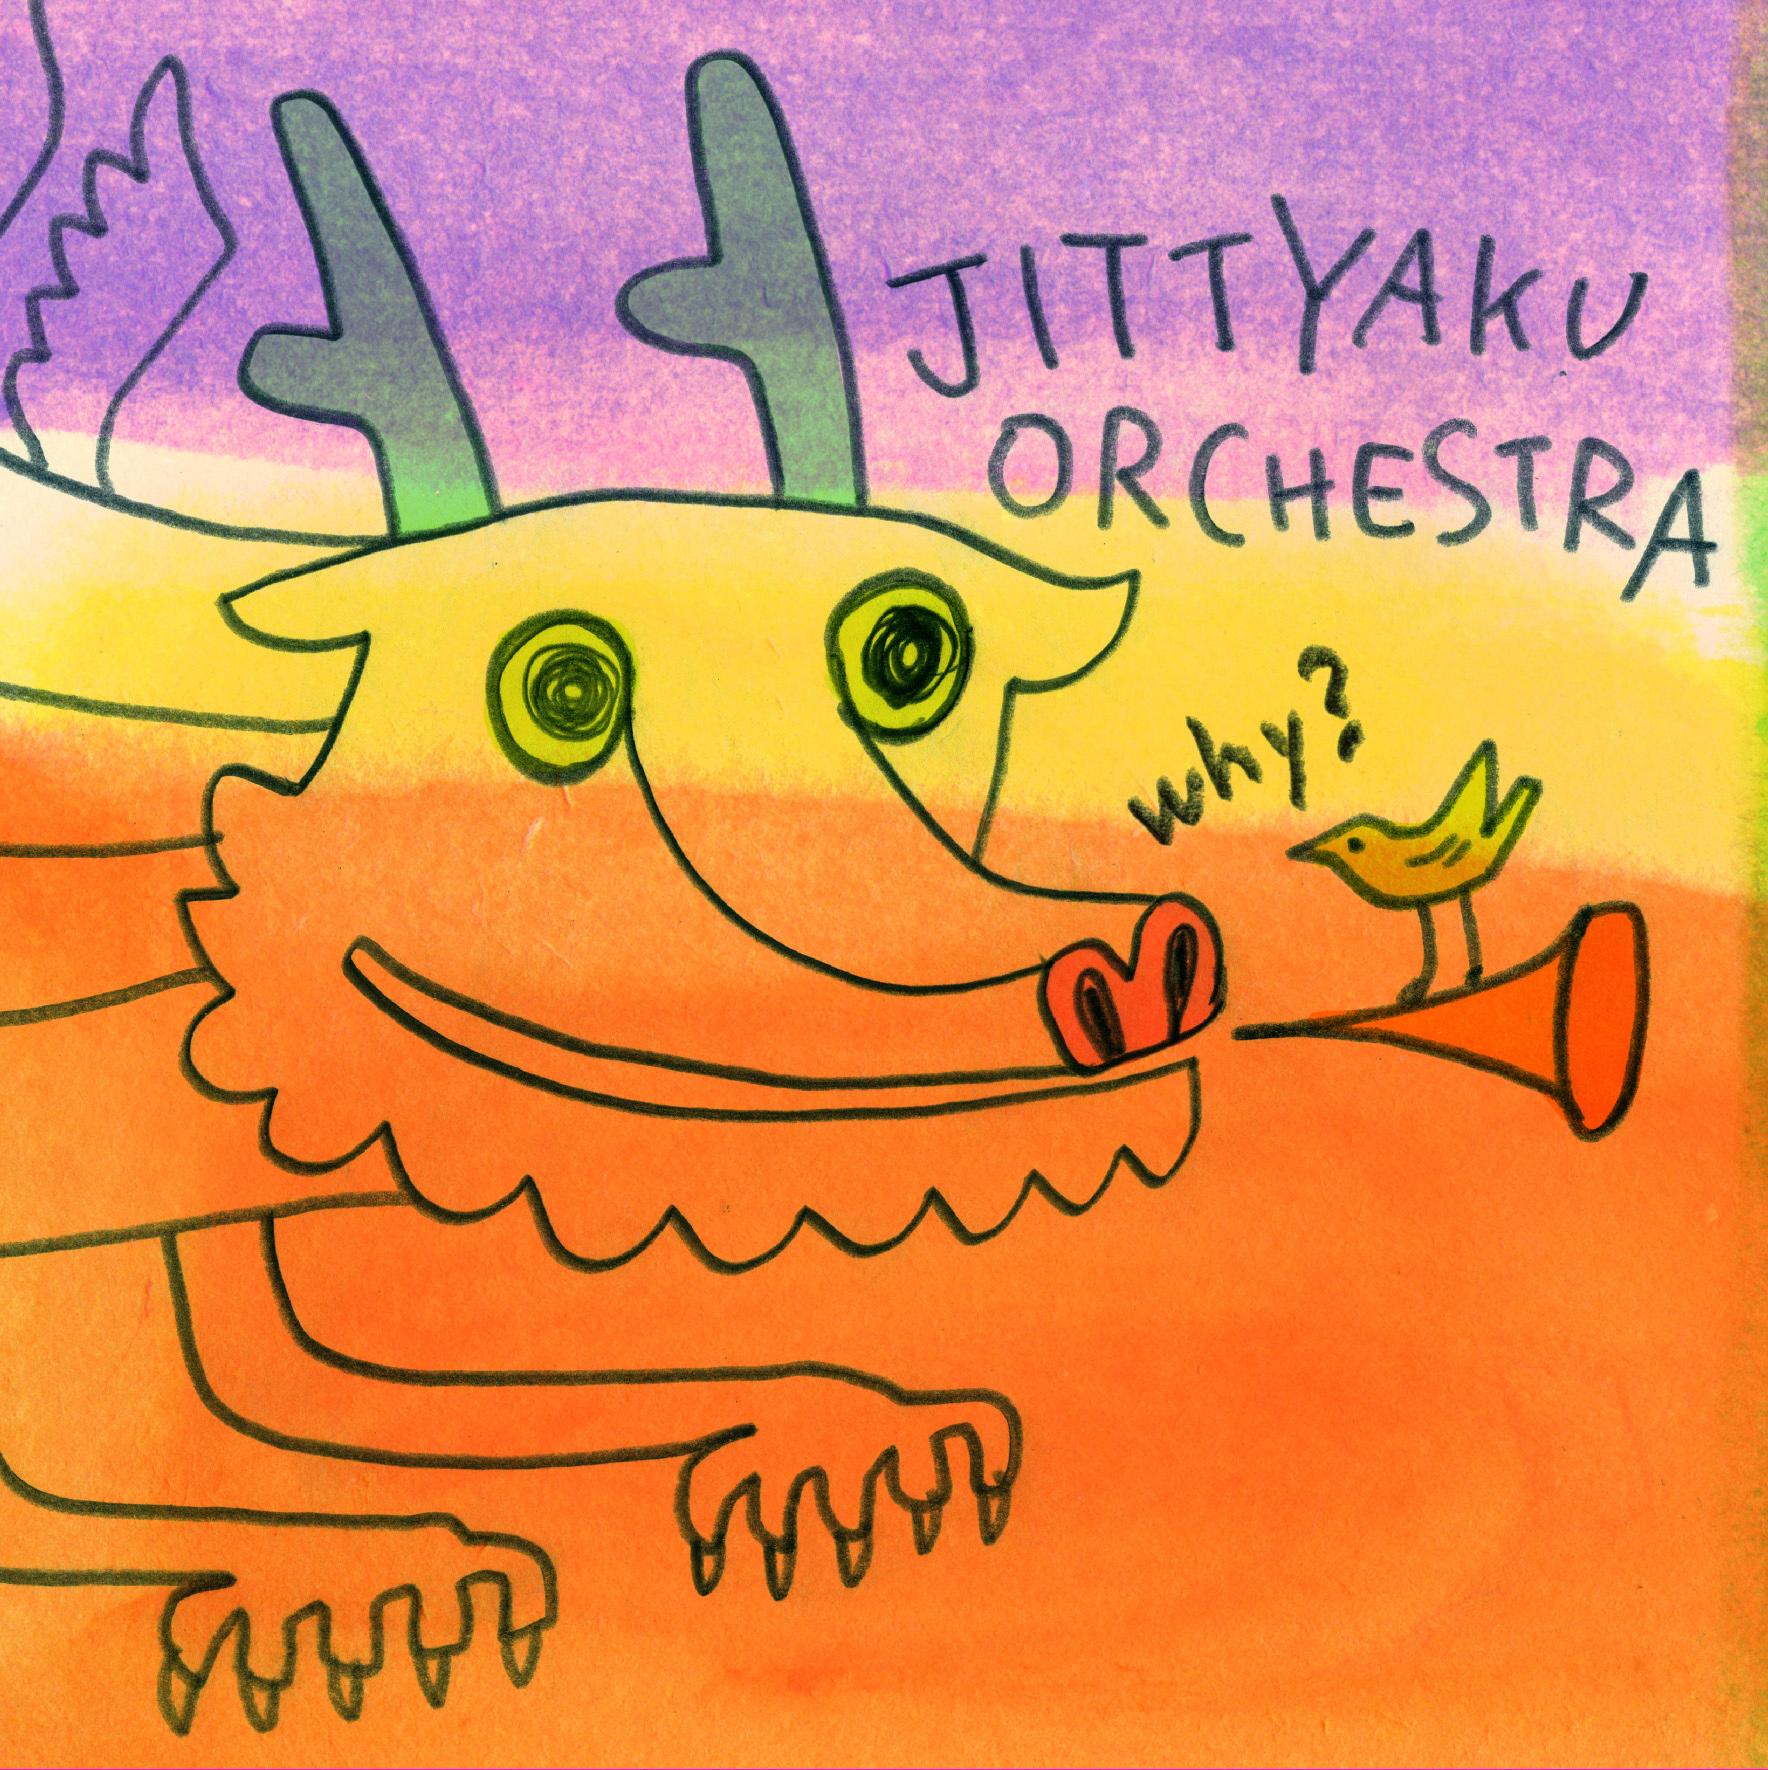 【CD】勢理客オーケストラ / Jittyaku Orchestra『why?』(沖縄 / Okinawa)